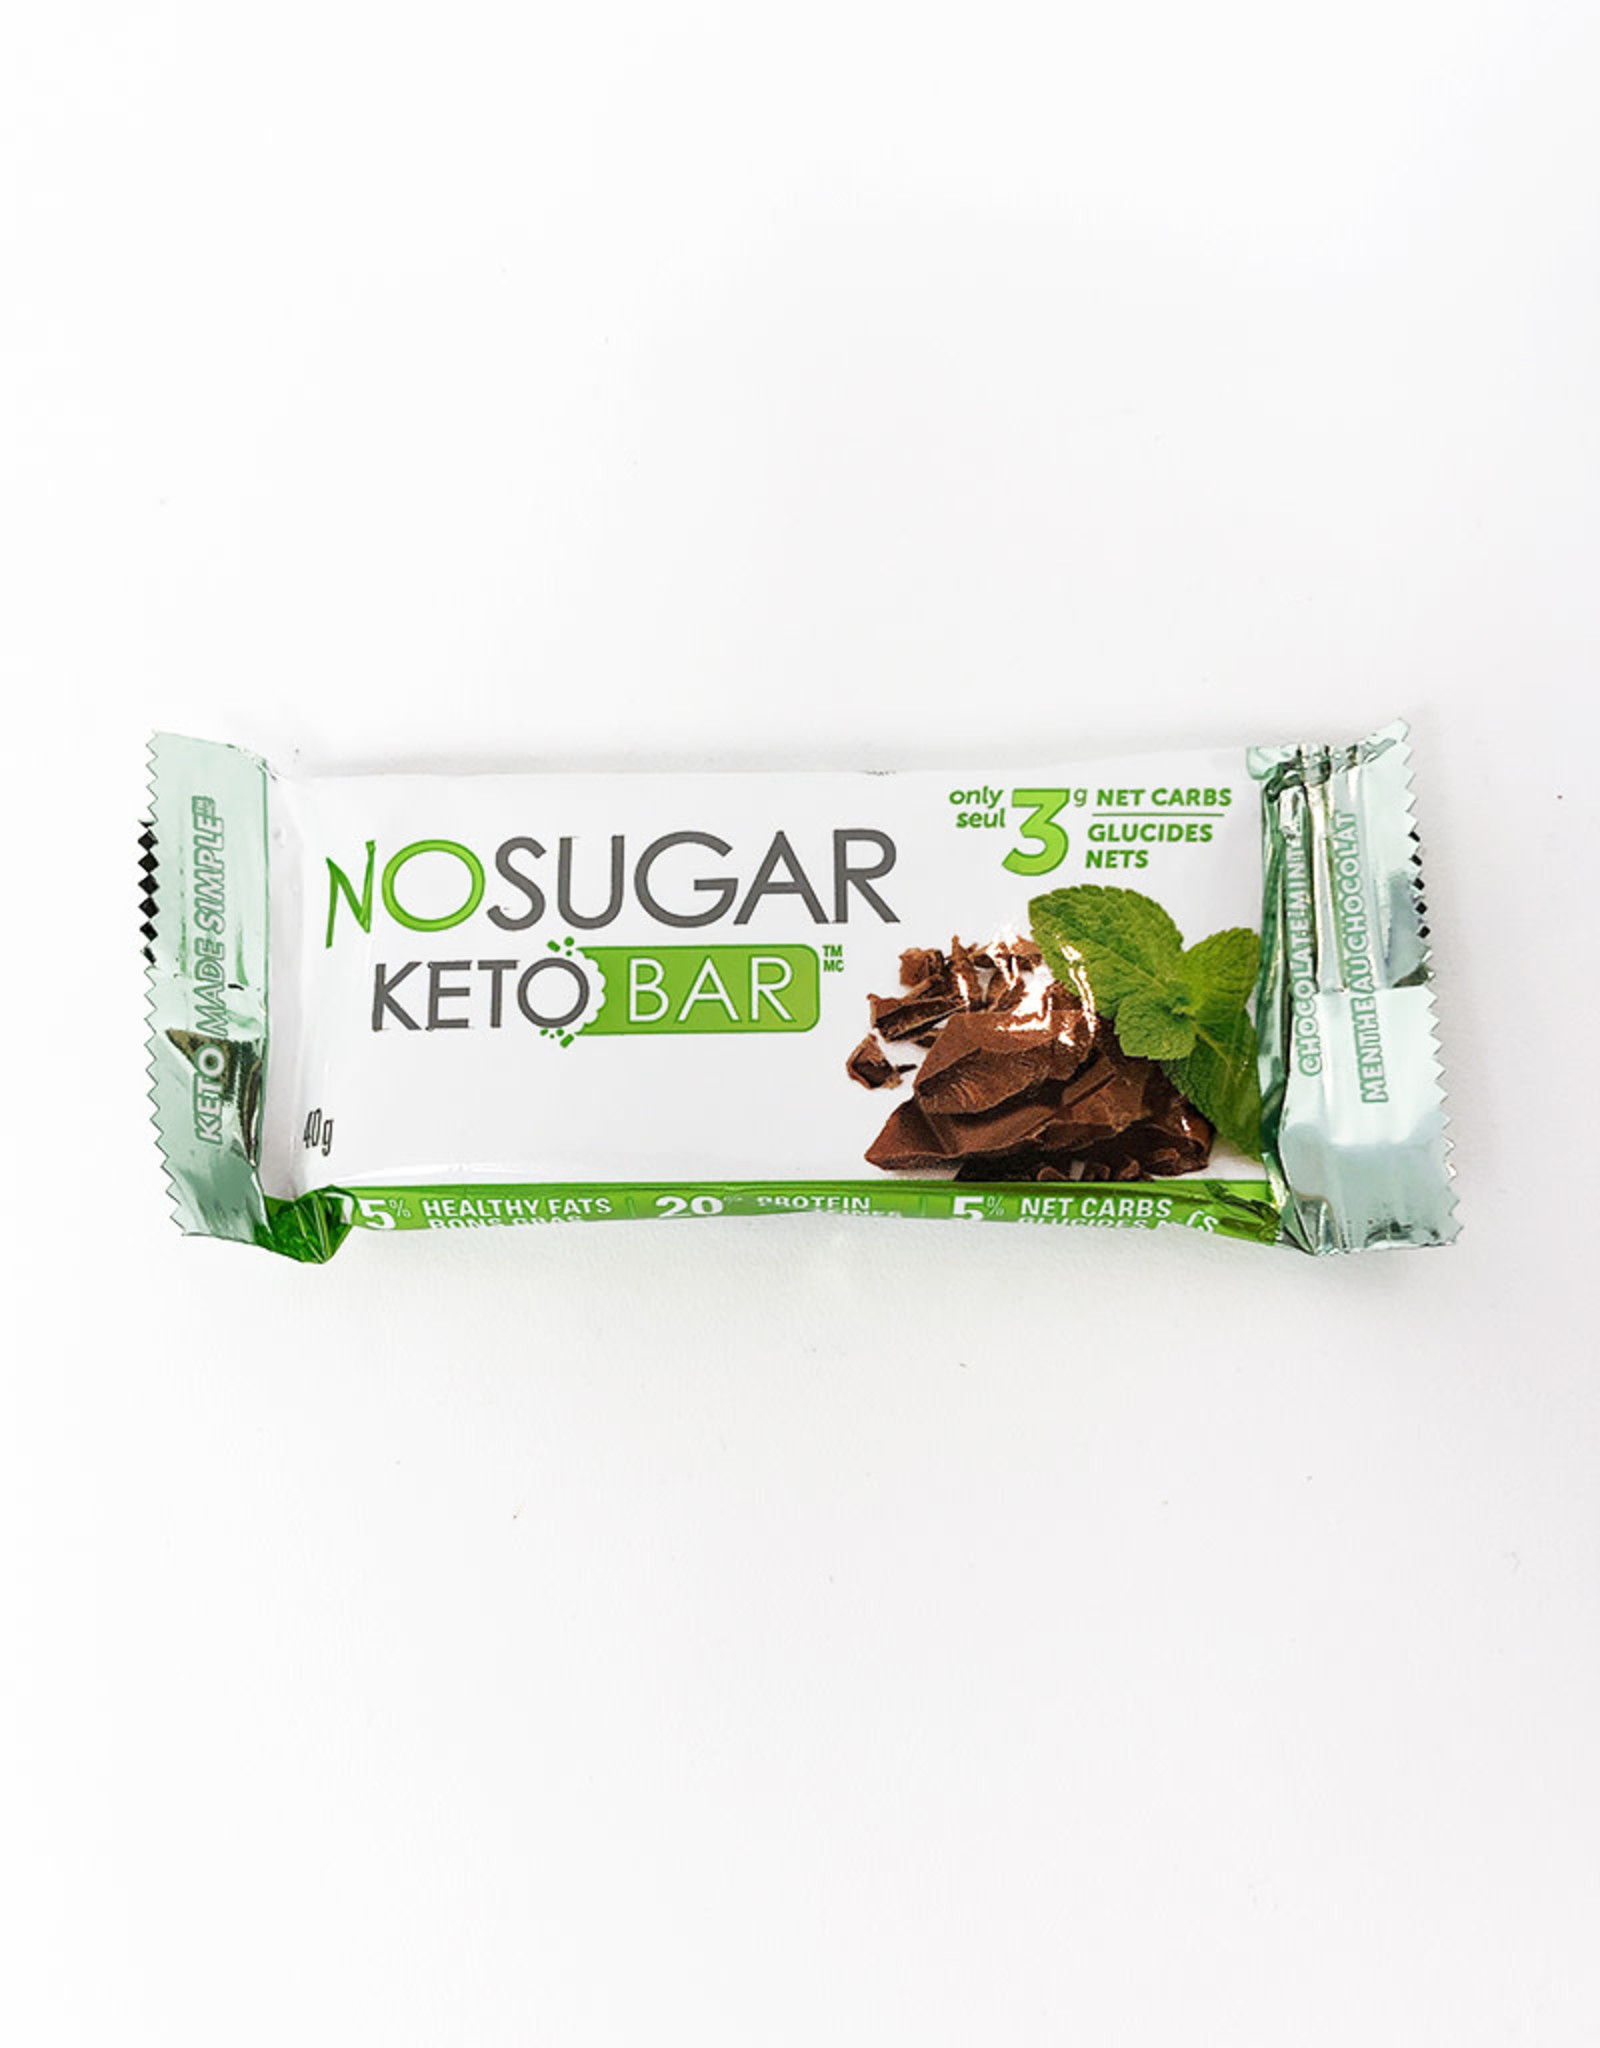 Vegan Pure Vegan Pure - Keto Bar, Chocolate Mint (40g)